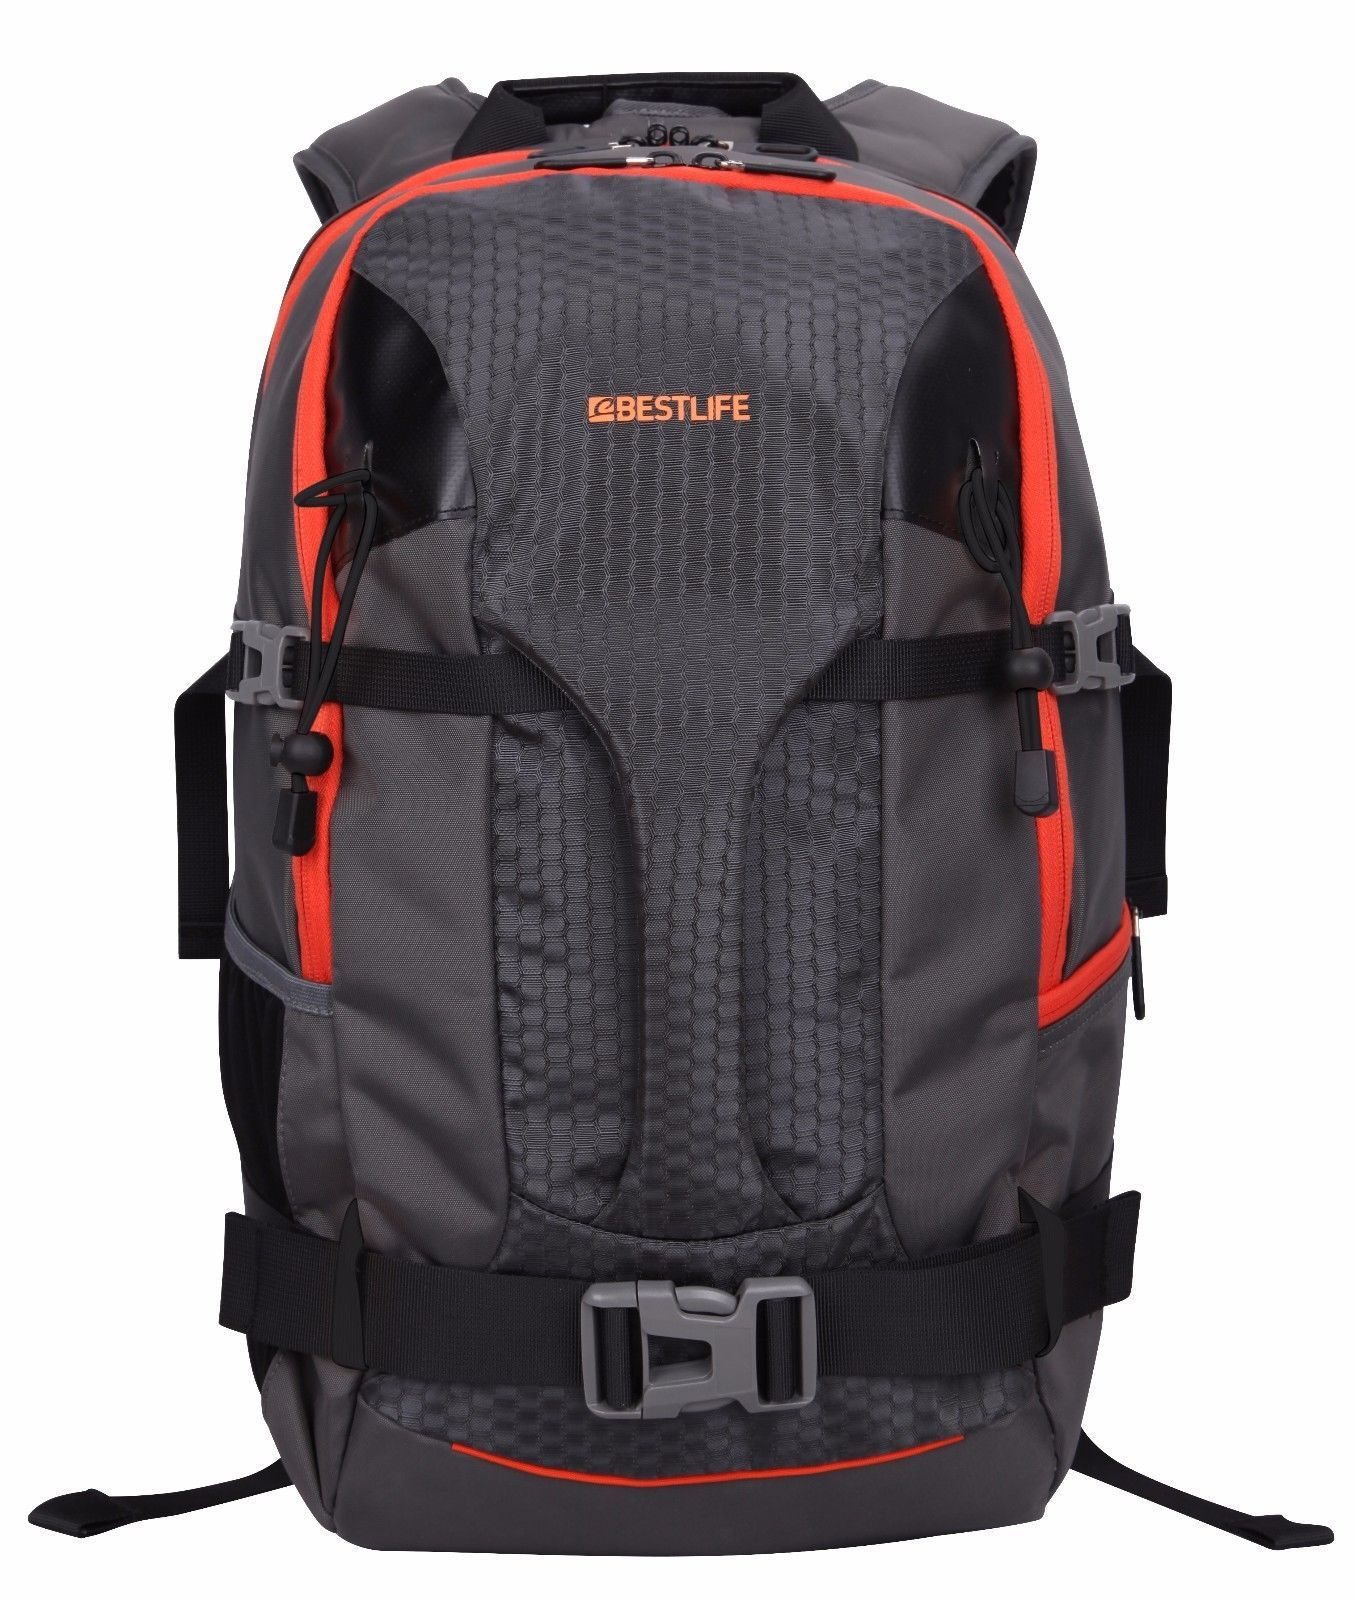 BESTLIFE Active Grab-n-Go Skateboard Backpack or Outdoor Travelers Bag Daypack